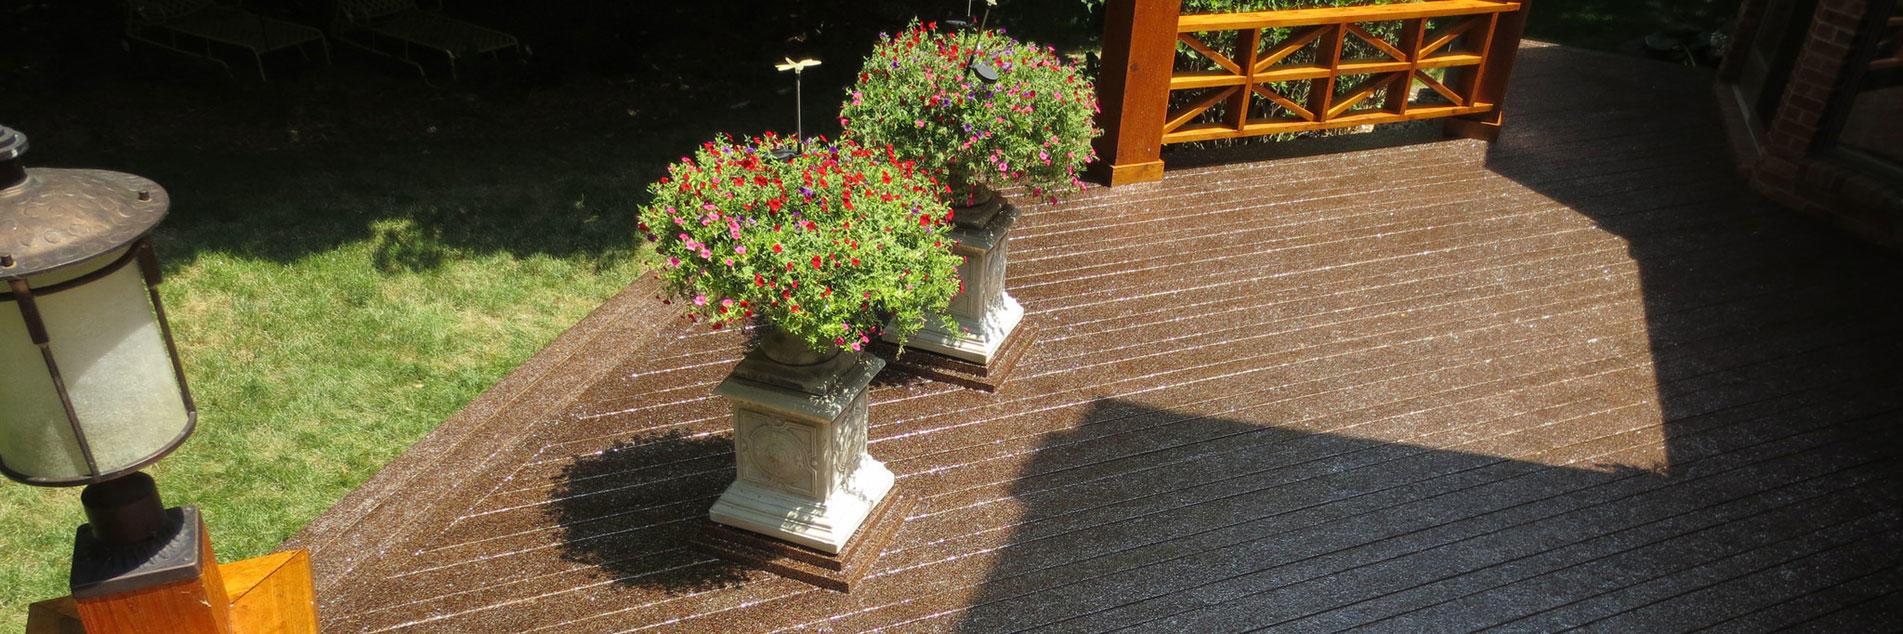 Special Concrete Solutions LLC image 2